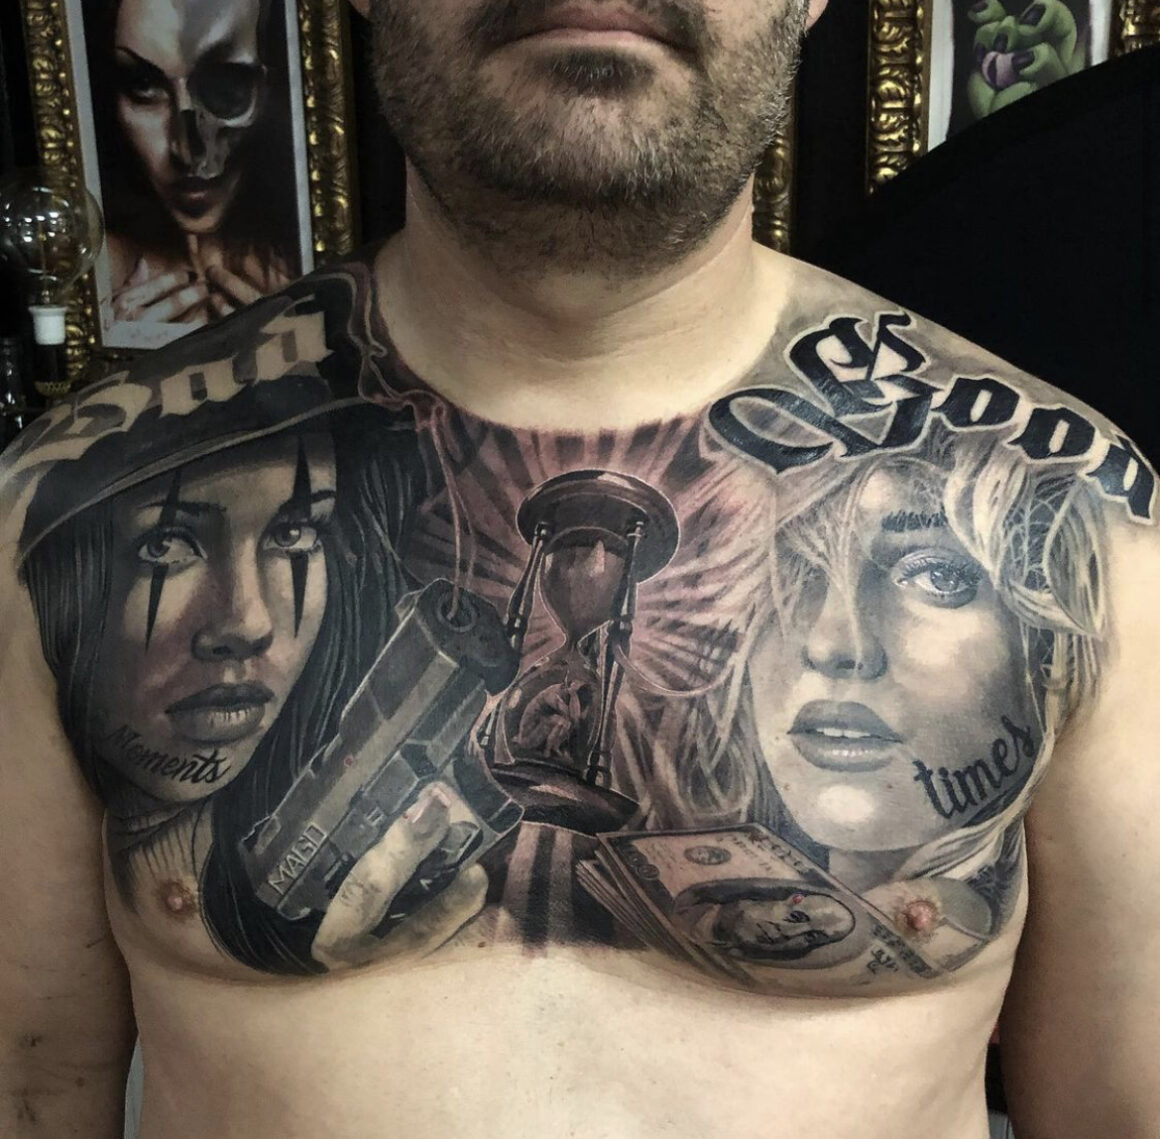 Samuel Sancho, Wanted Tattoo, Mollet Del Valles, Spain